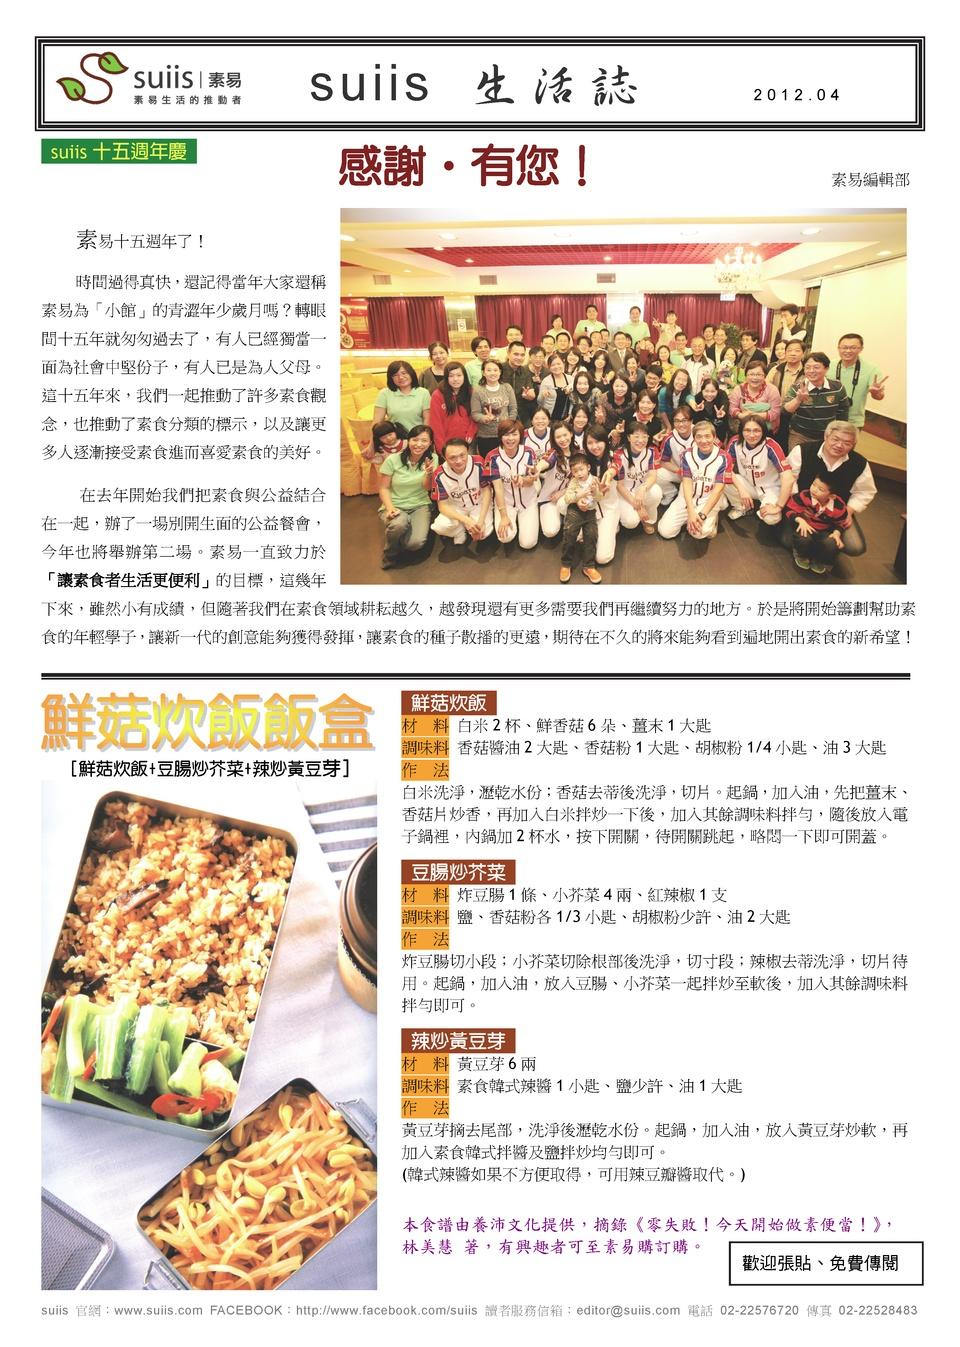 suiis 生活誌-2012-04_Page_1